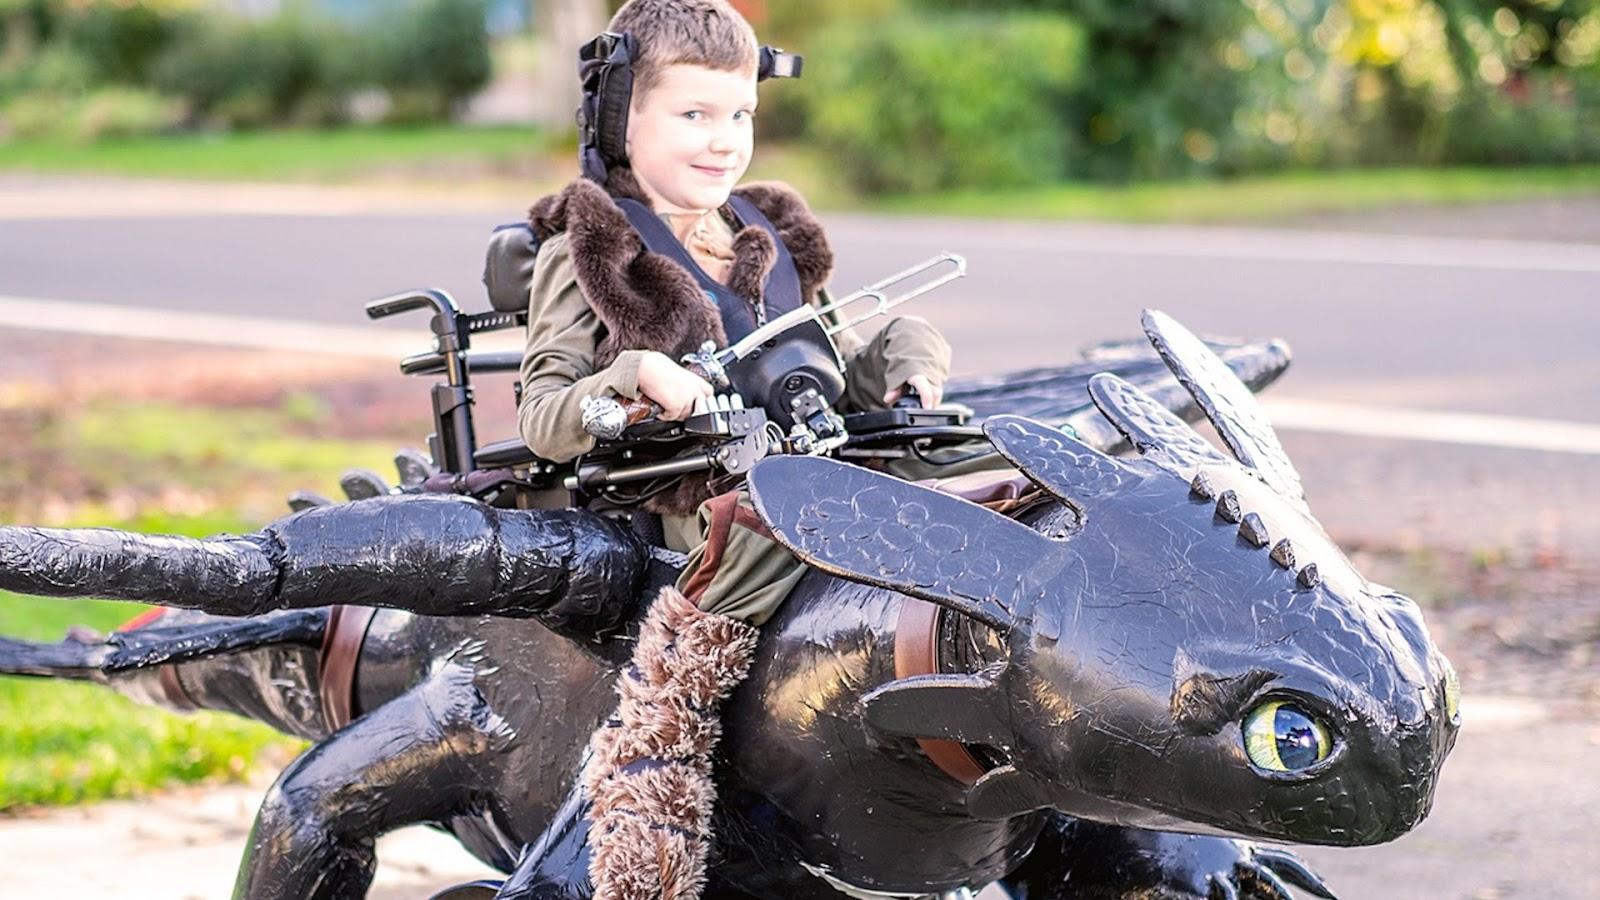 Wheelchair Killer Ab Exercise Chair As Seen On Tv Magic Creates Halloween Costumes For Kids In Wheelchairs Bob S Blitz